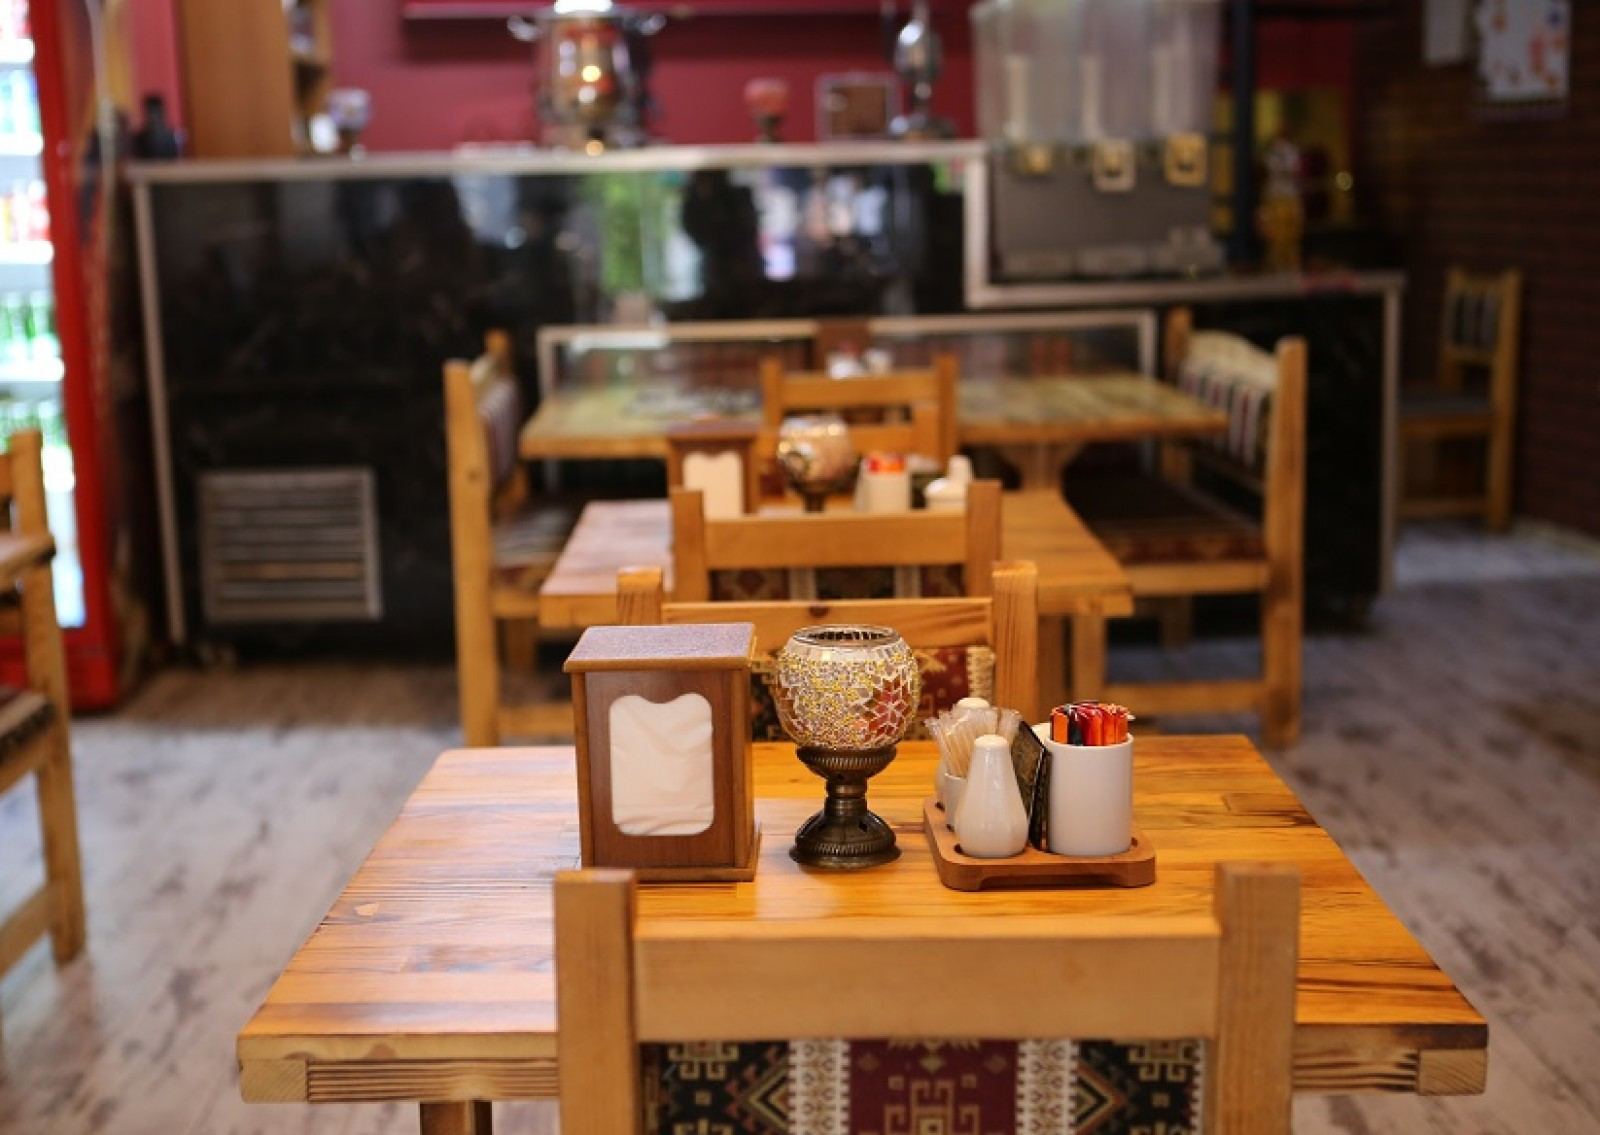 ORTAKÖY'DE İŞLEK KONUMDA RESTORAN-CAFE